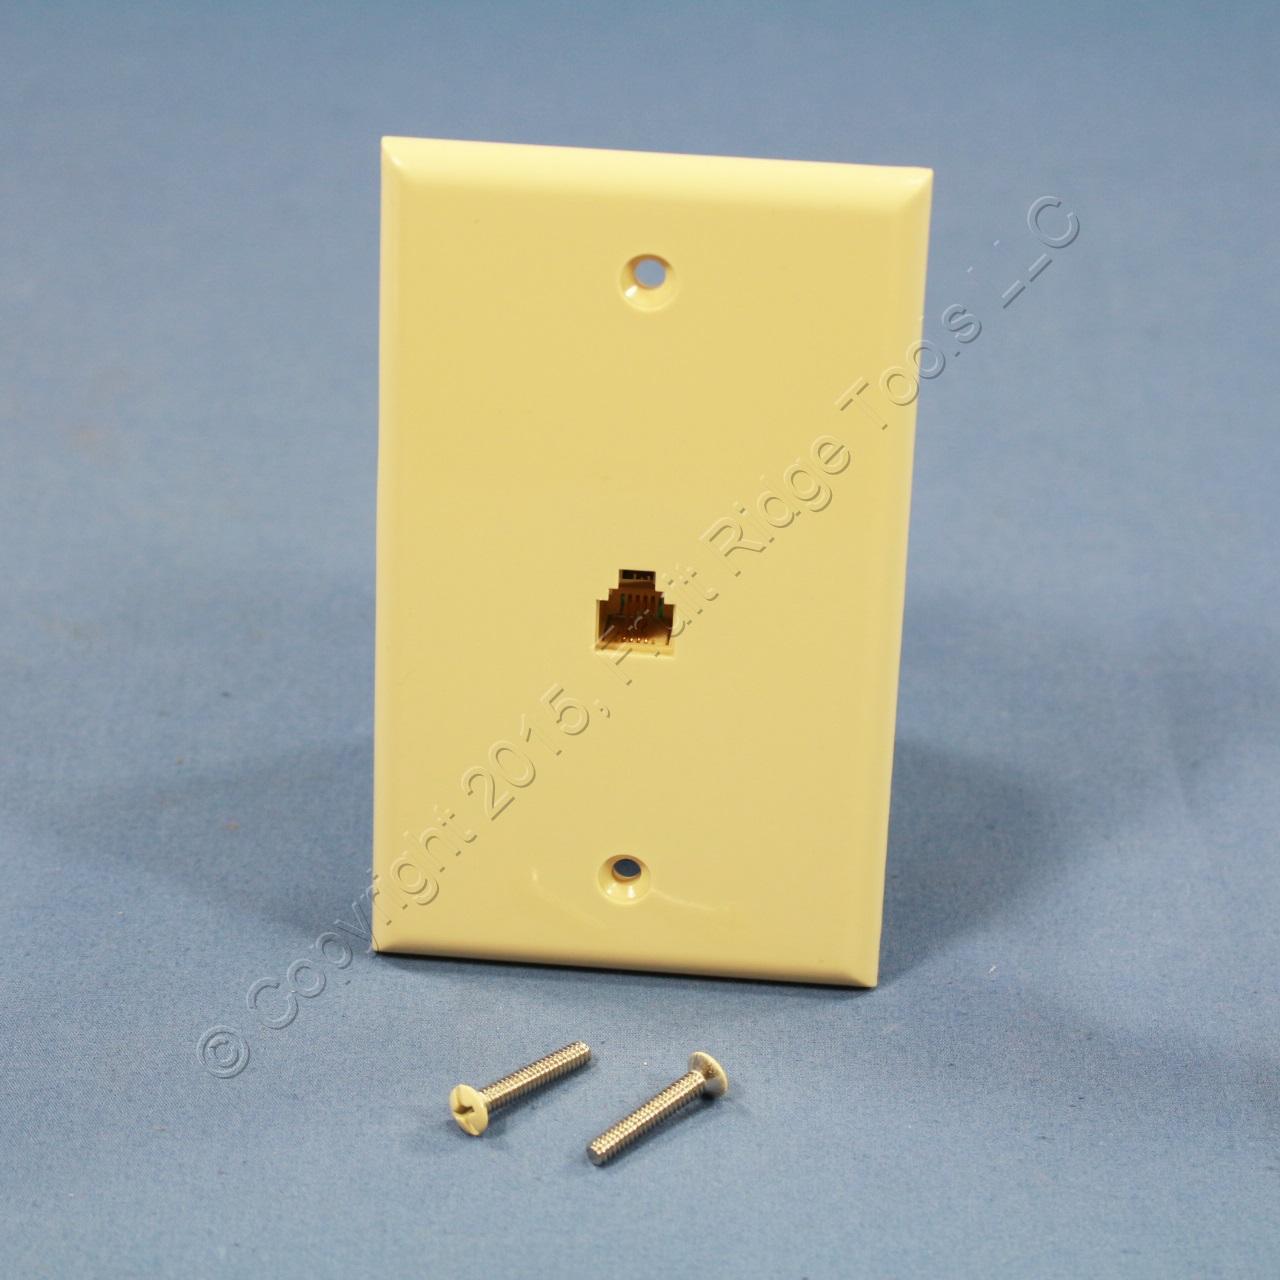 leviton ivory 4 wire phone jack wallplate rj11 modular. Black Bedroom Furniture Sets. Home Design Ideas